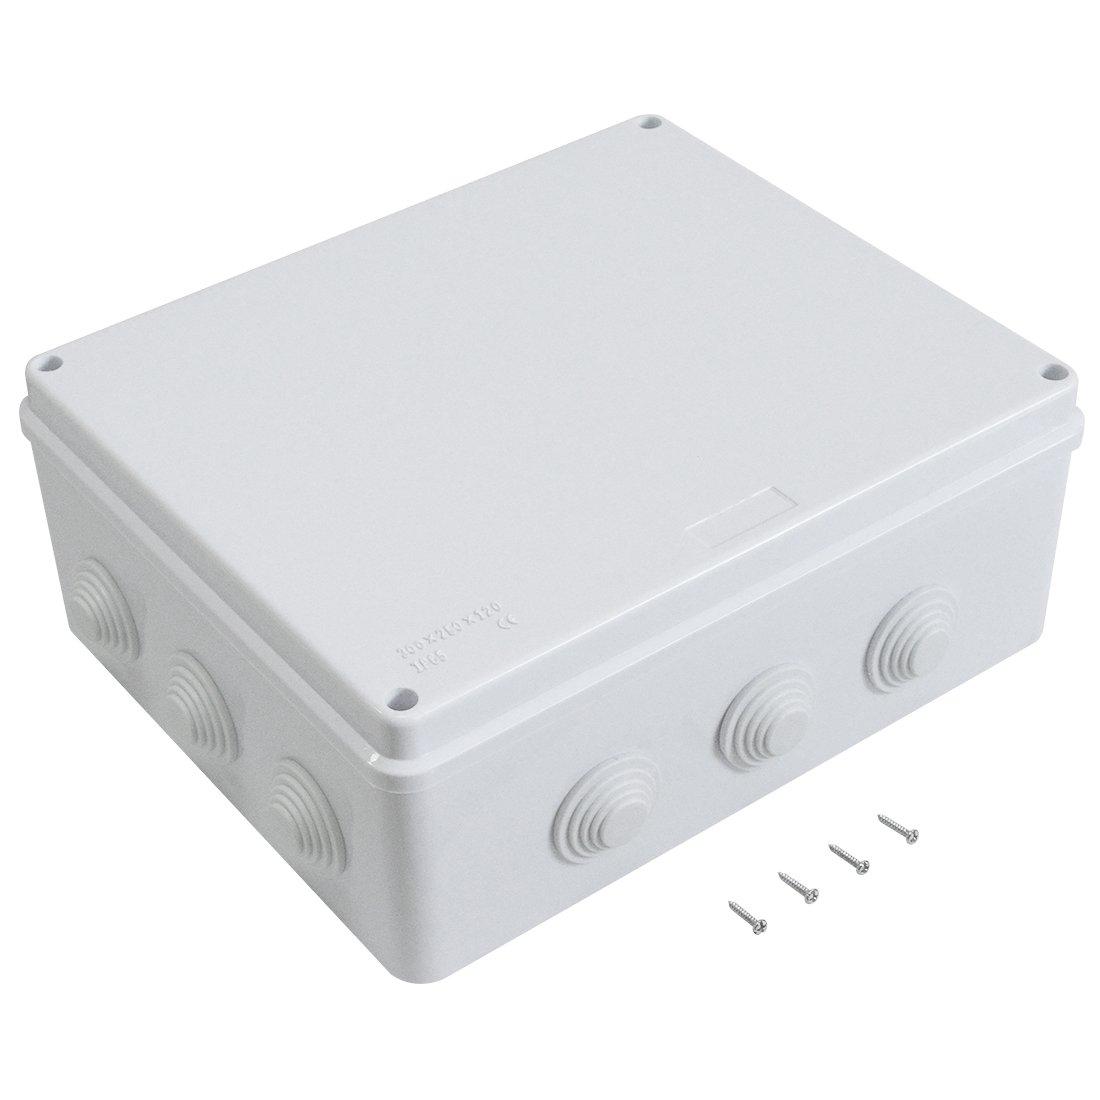 LeMotech ABS Plastic Dustproof Waterproof IP65 Junction Box Universal Electrical Project Enclosure White 5.9' x 5.9' x 2.8'(150mmx150mmx70mm)